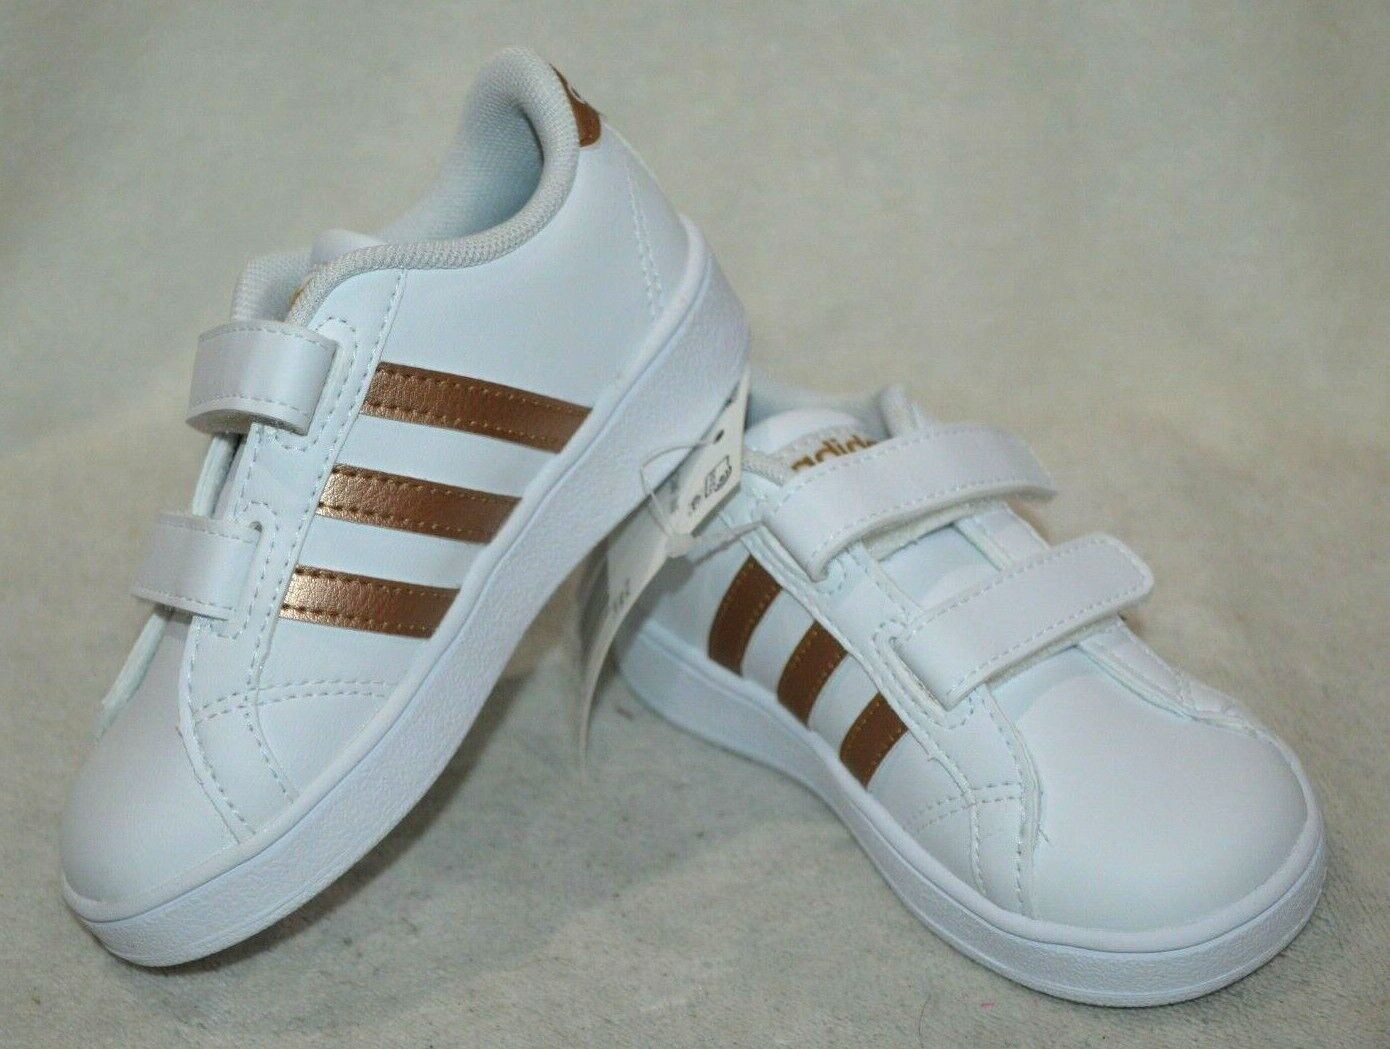 adidas Baseline CMF INF White/Copper Girl's Toddler Sneaker-7/8/9/10K NWB DB2755